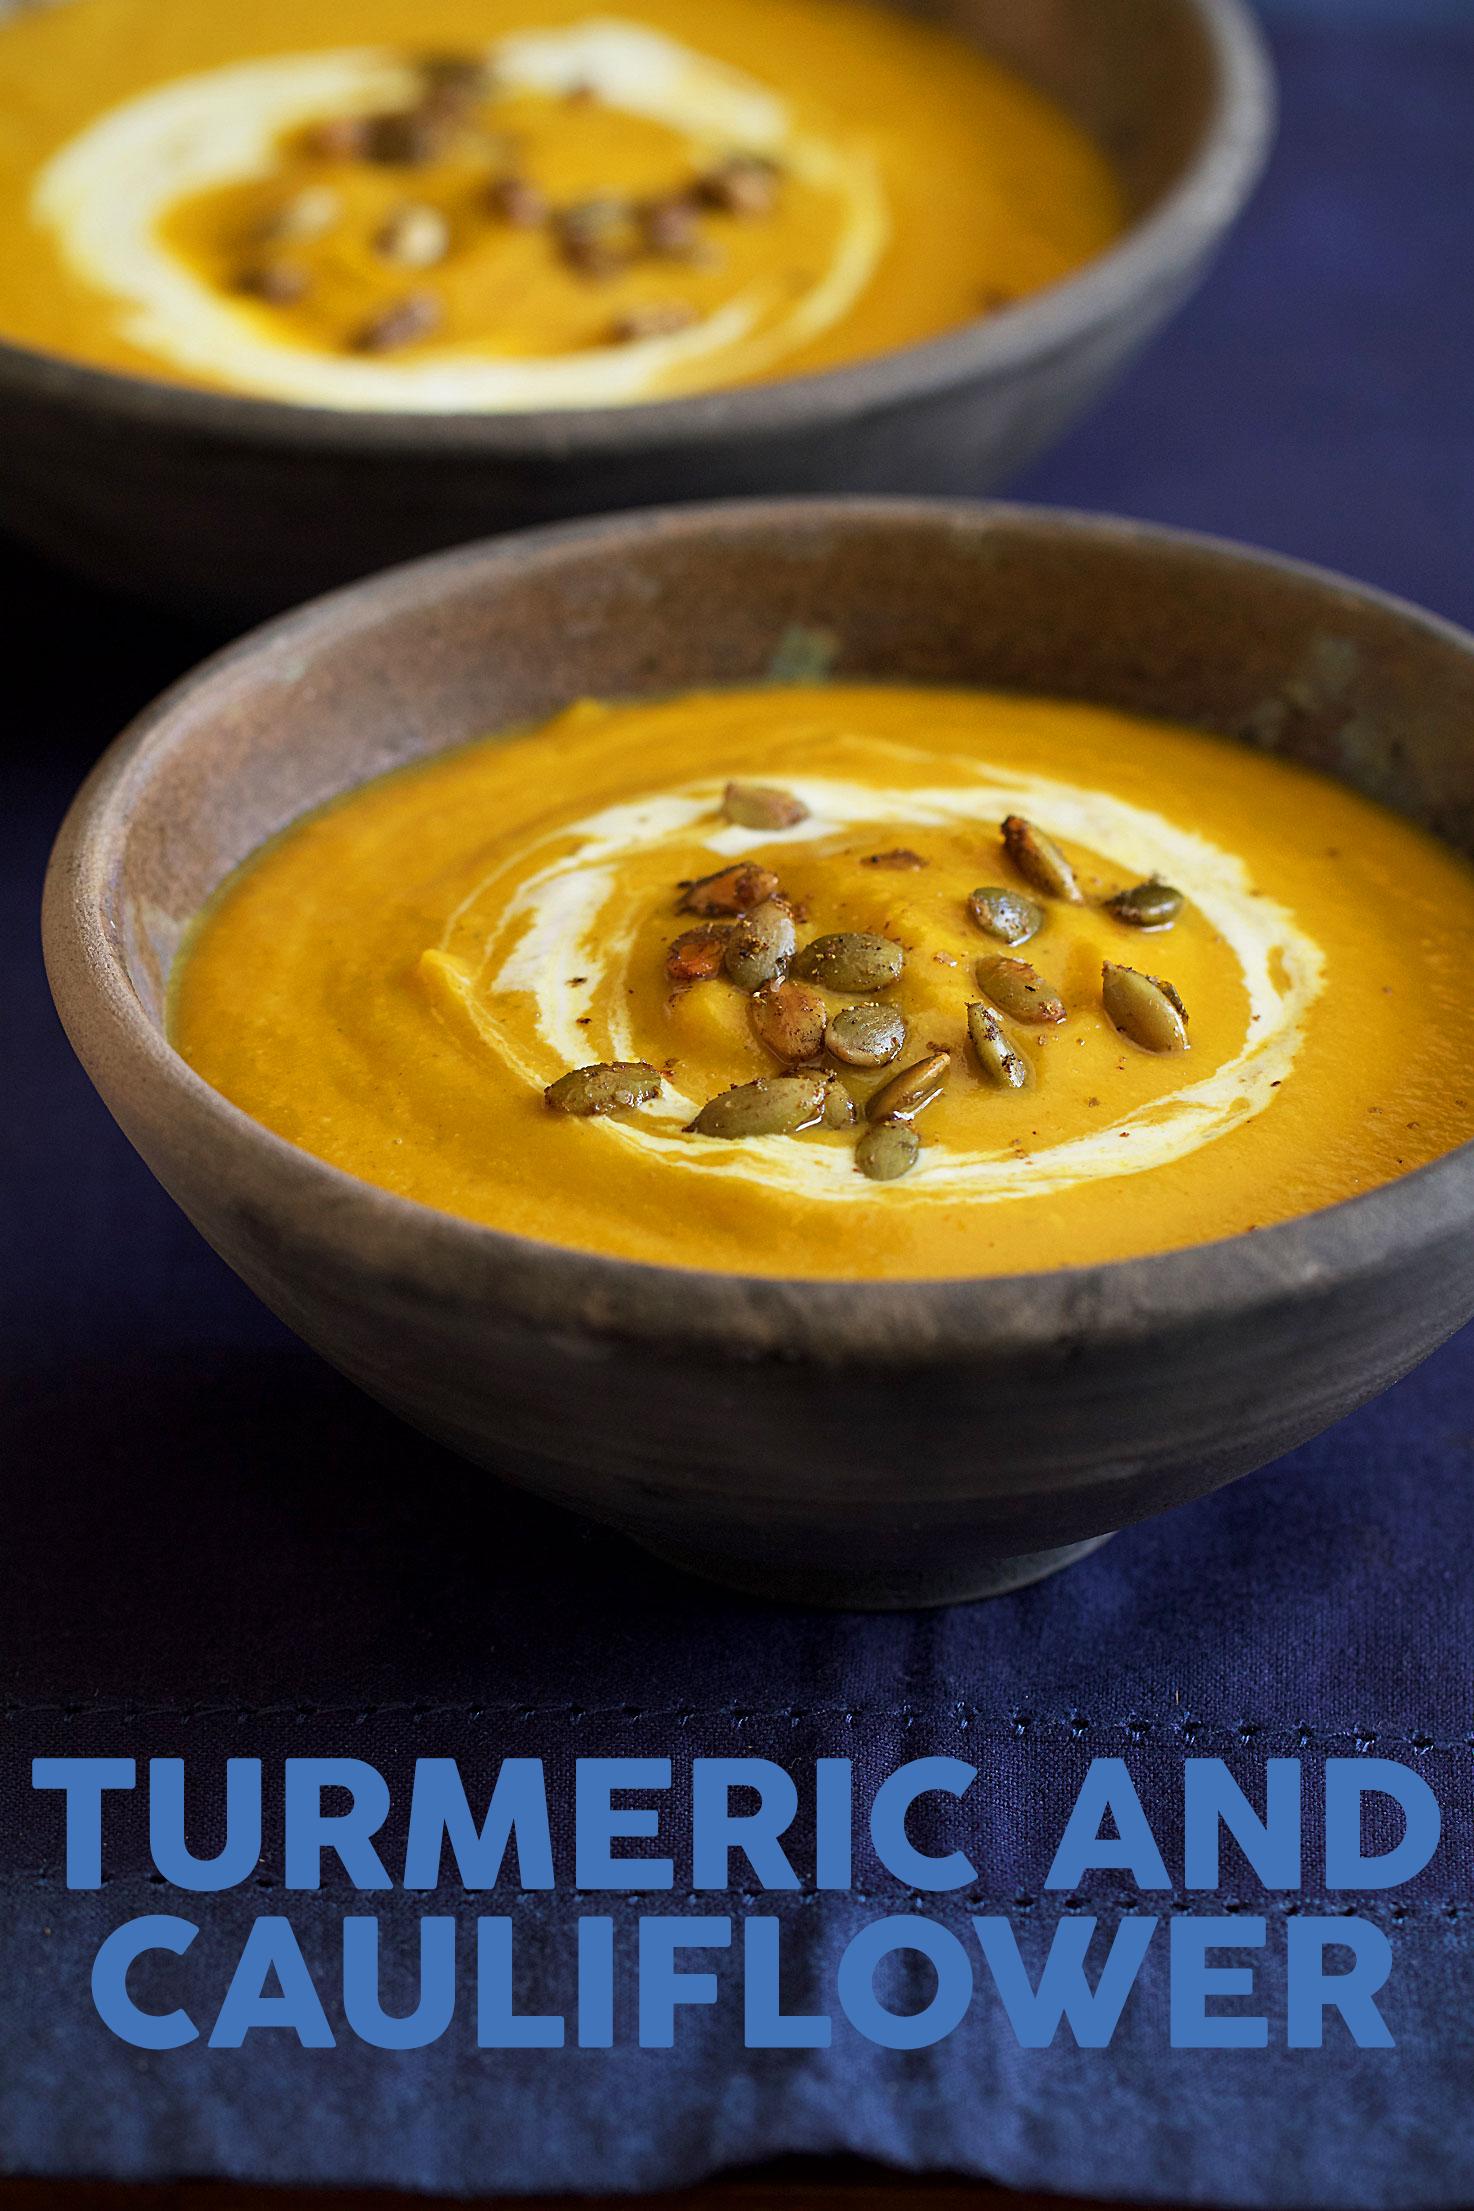 Velvety Turmeric and Cauliflower Soup